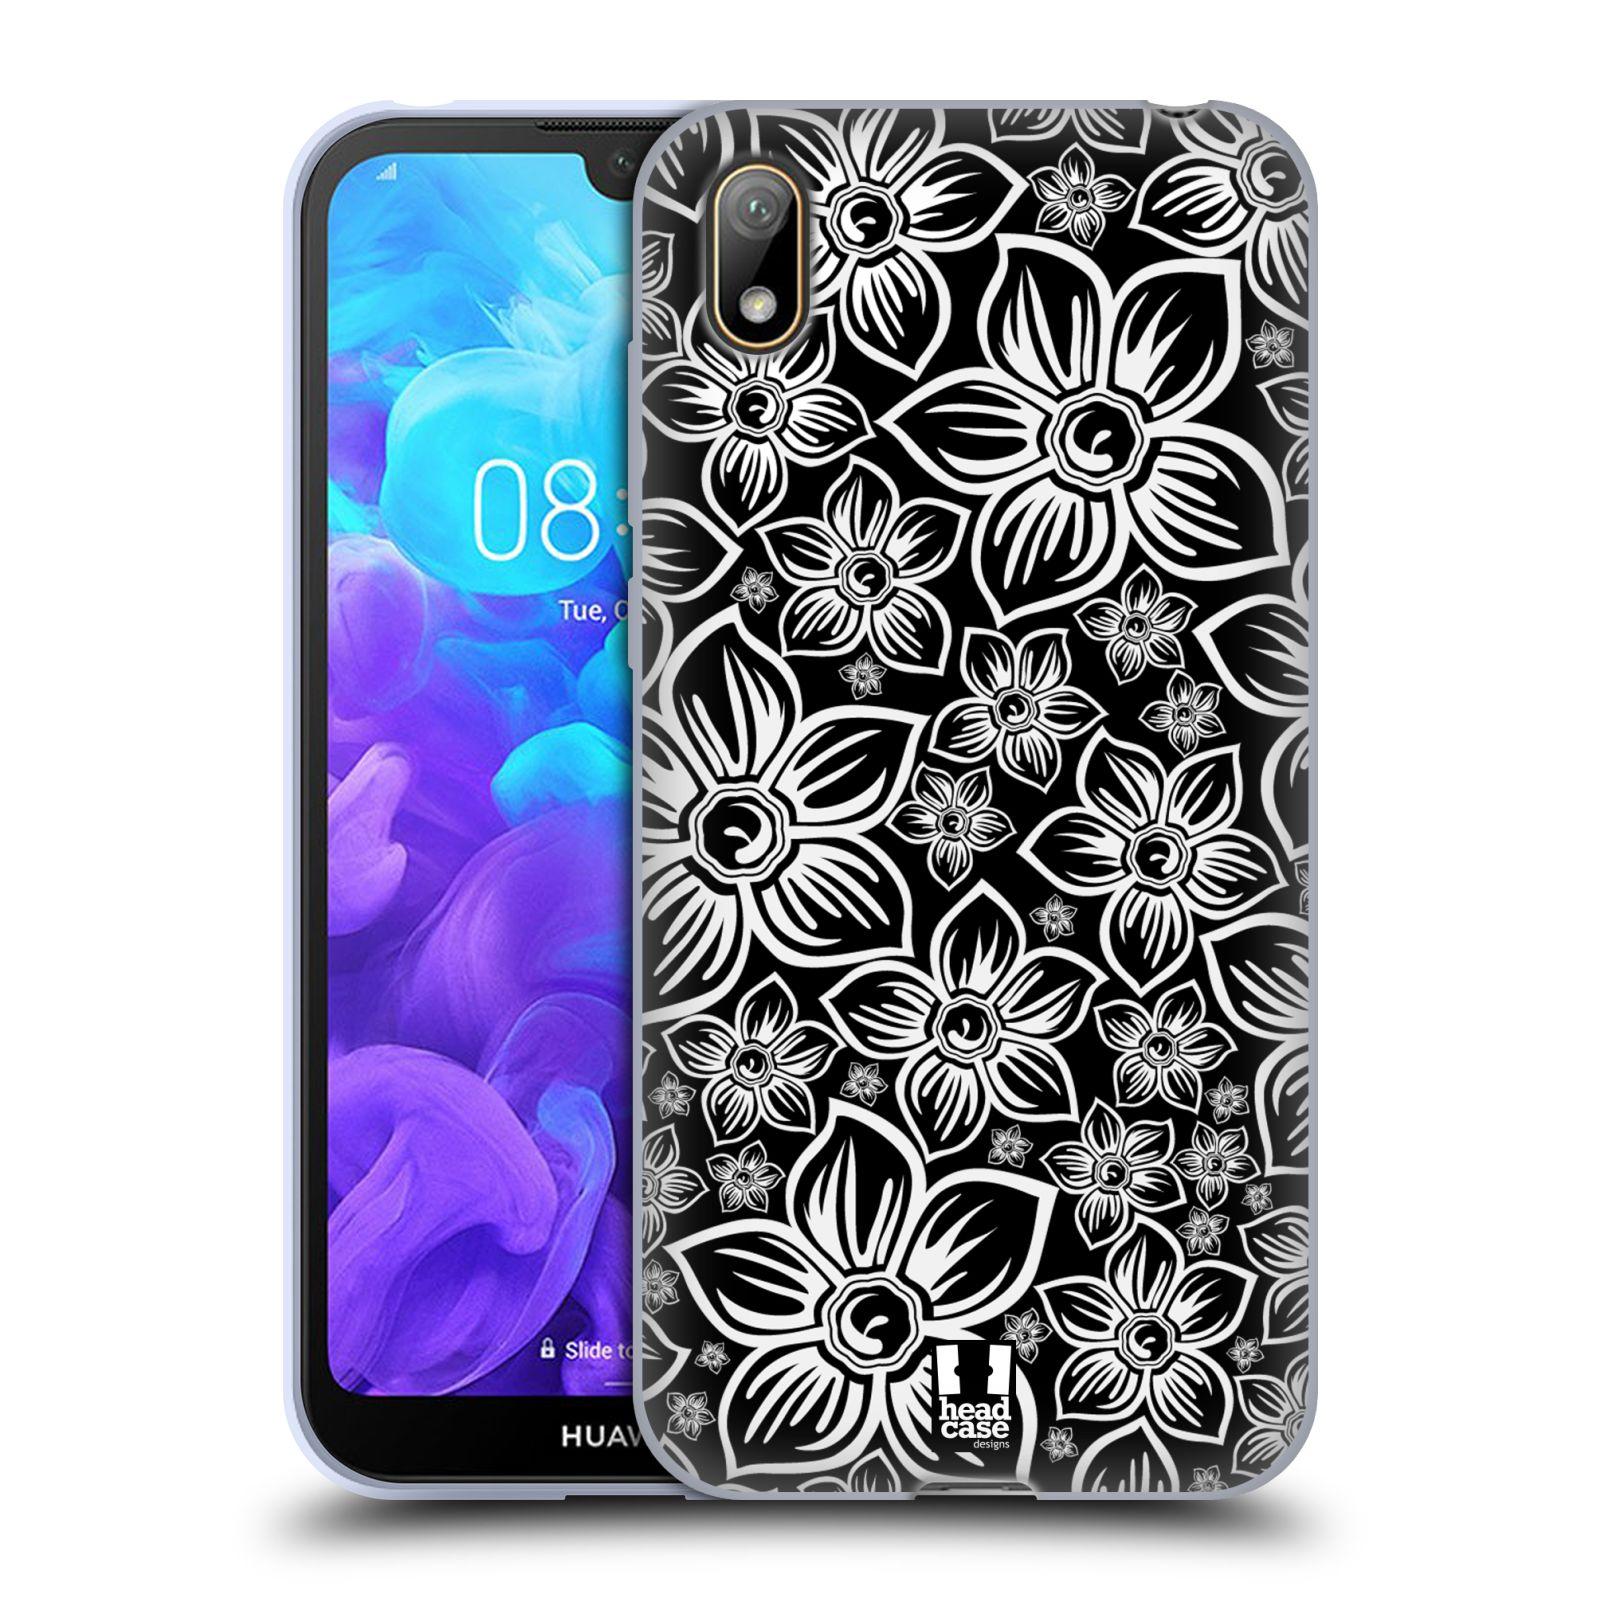 Silikonové pouzdro na mobil Huawei Y5 (2019) - Head Case - FLORAL DAISY